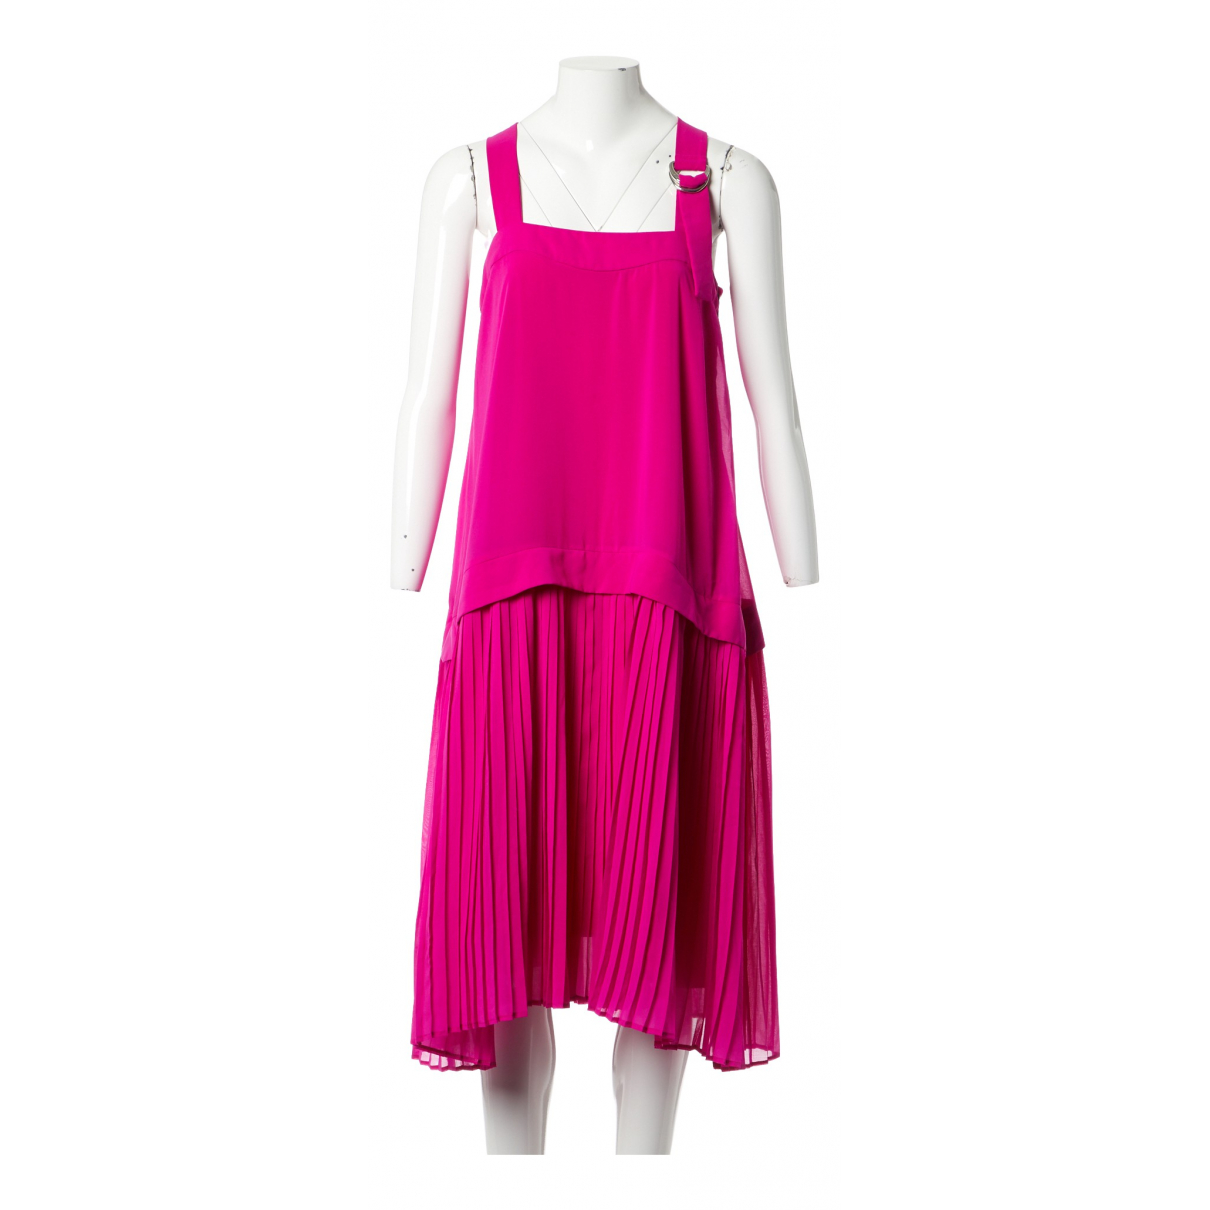 Kenzo N Pink dress for Women 38 FR